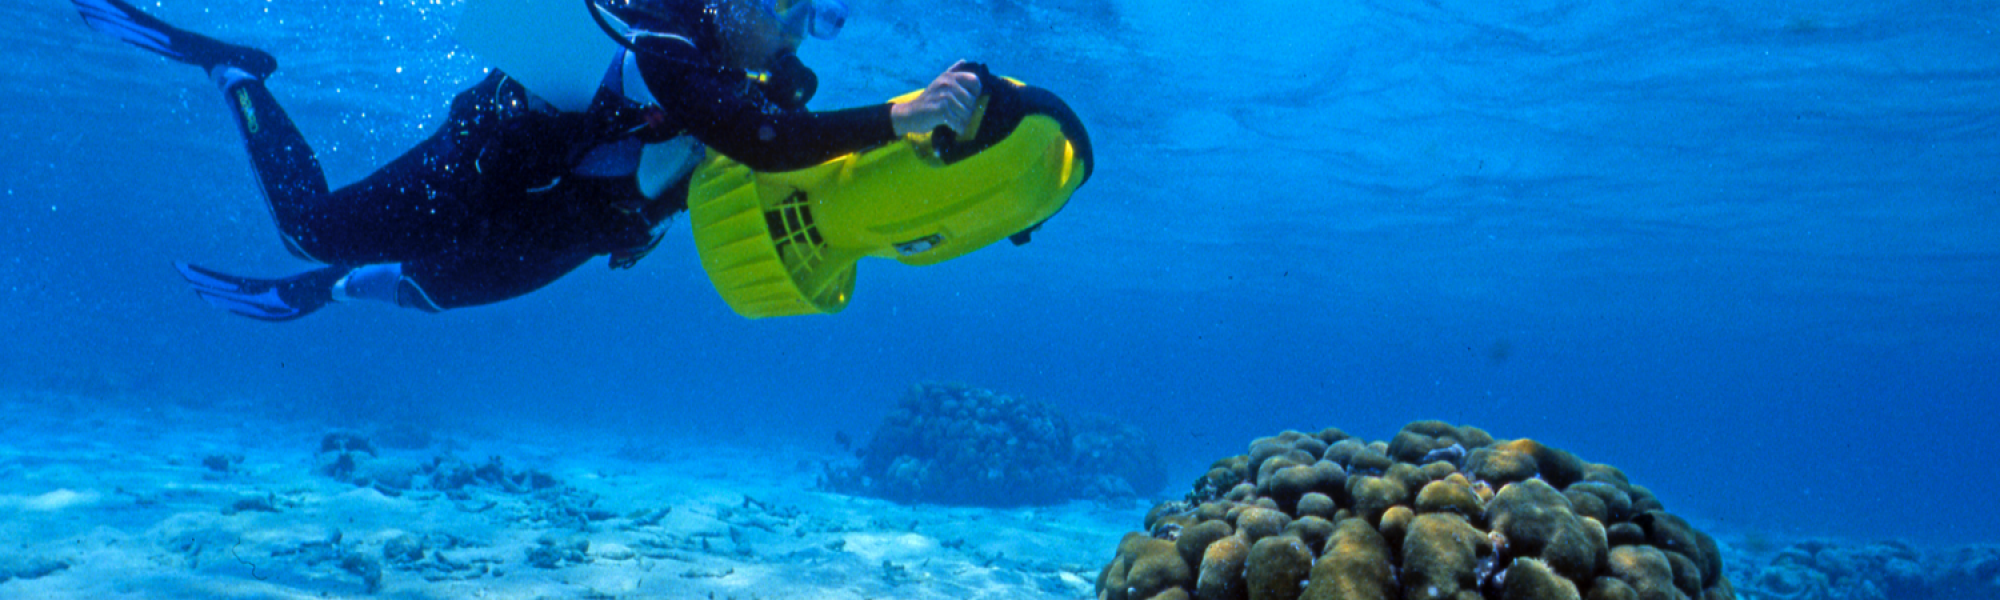 Exploration des fonds à l'aide d'un «scooter» sous-marin (Grand Cul-Sac-Marin, Guadeloupe).